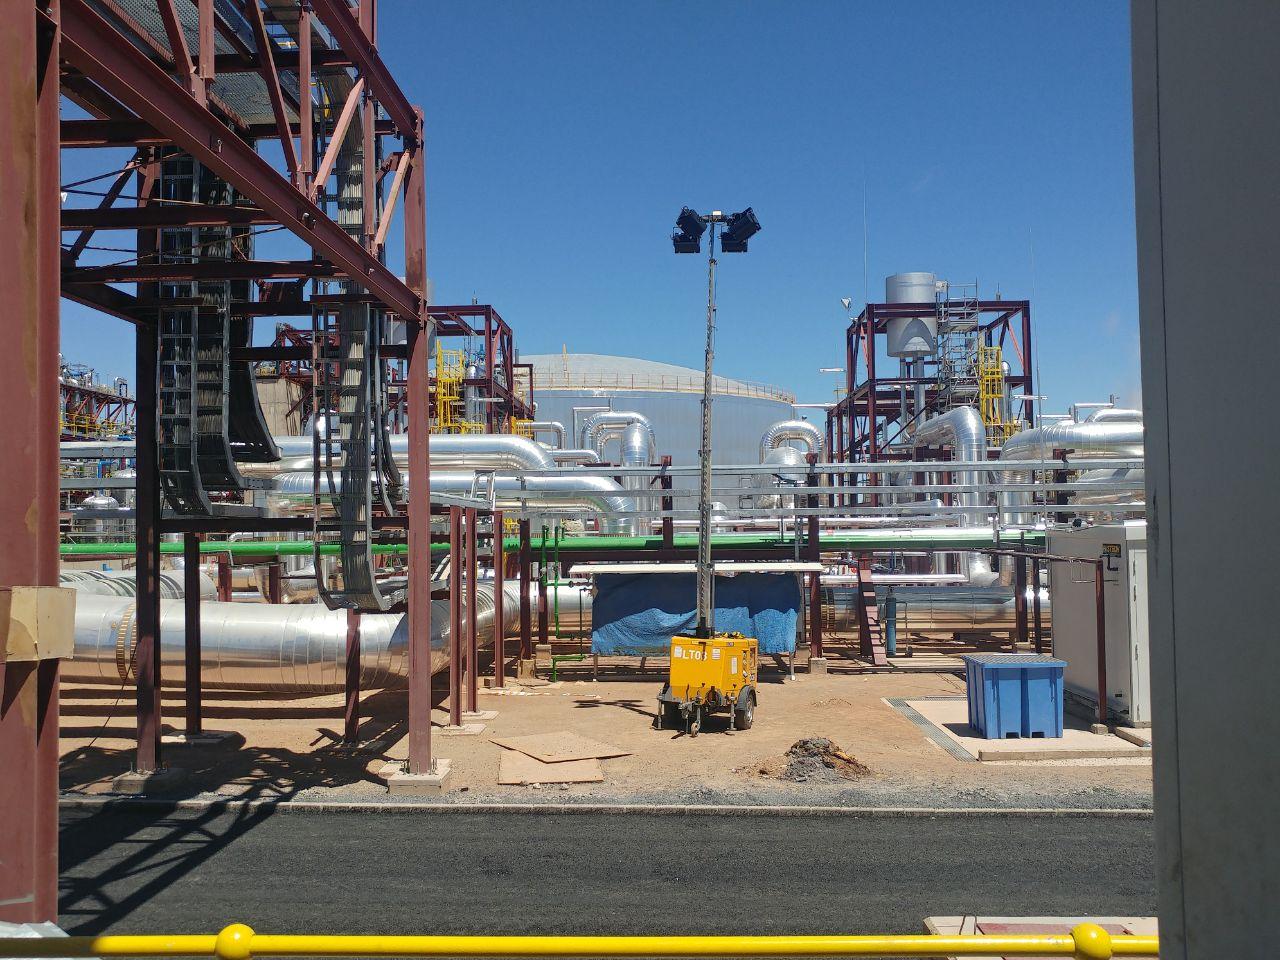 Airvent Airconditioning & Ventiliation Portfolio: Xina Solar Farm, Northern Cape